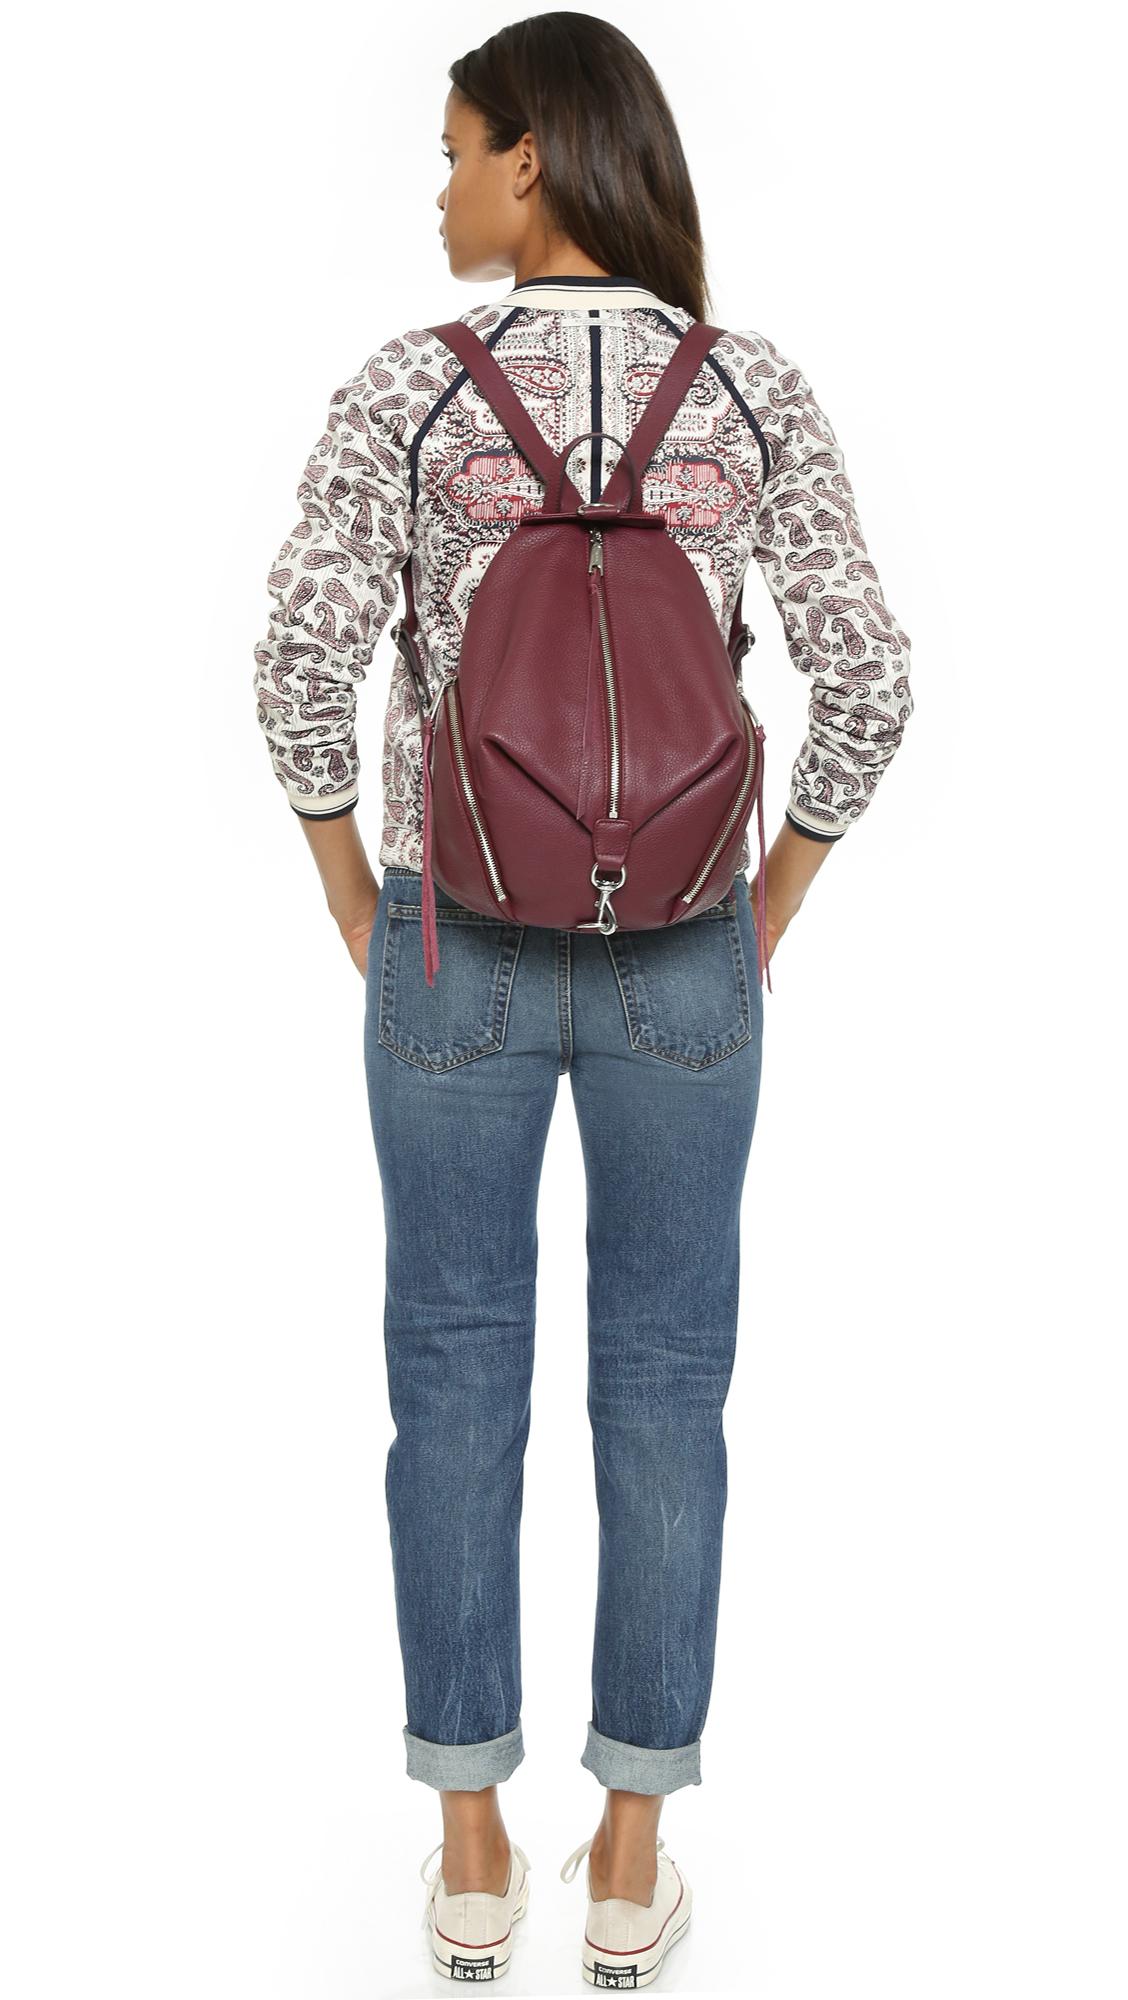 Rebecca Minkoff Julian Backpack - Port in Red